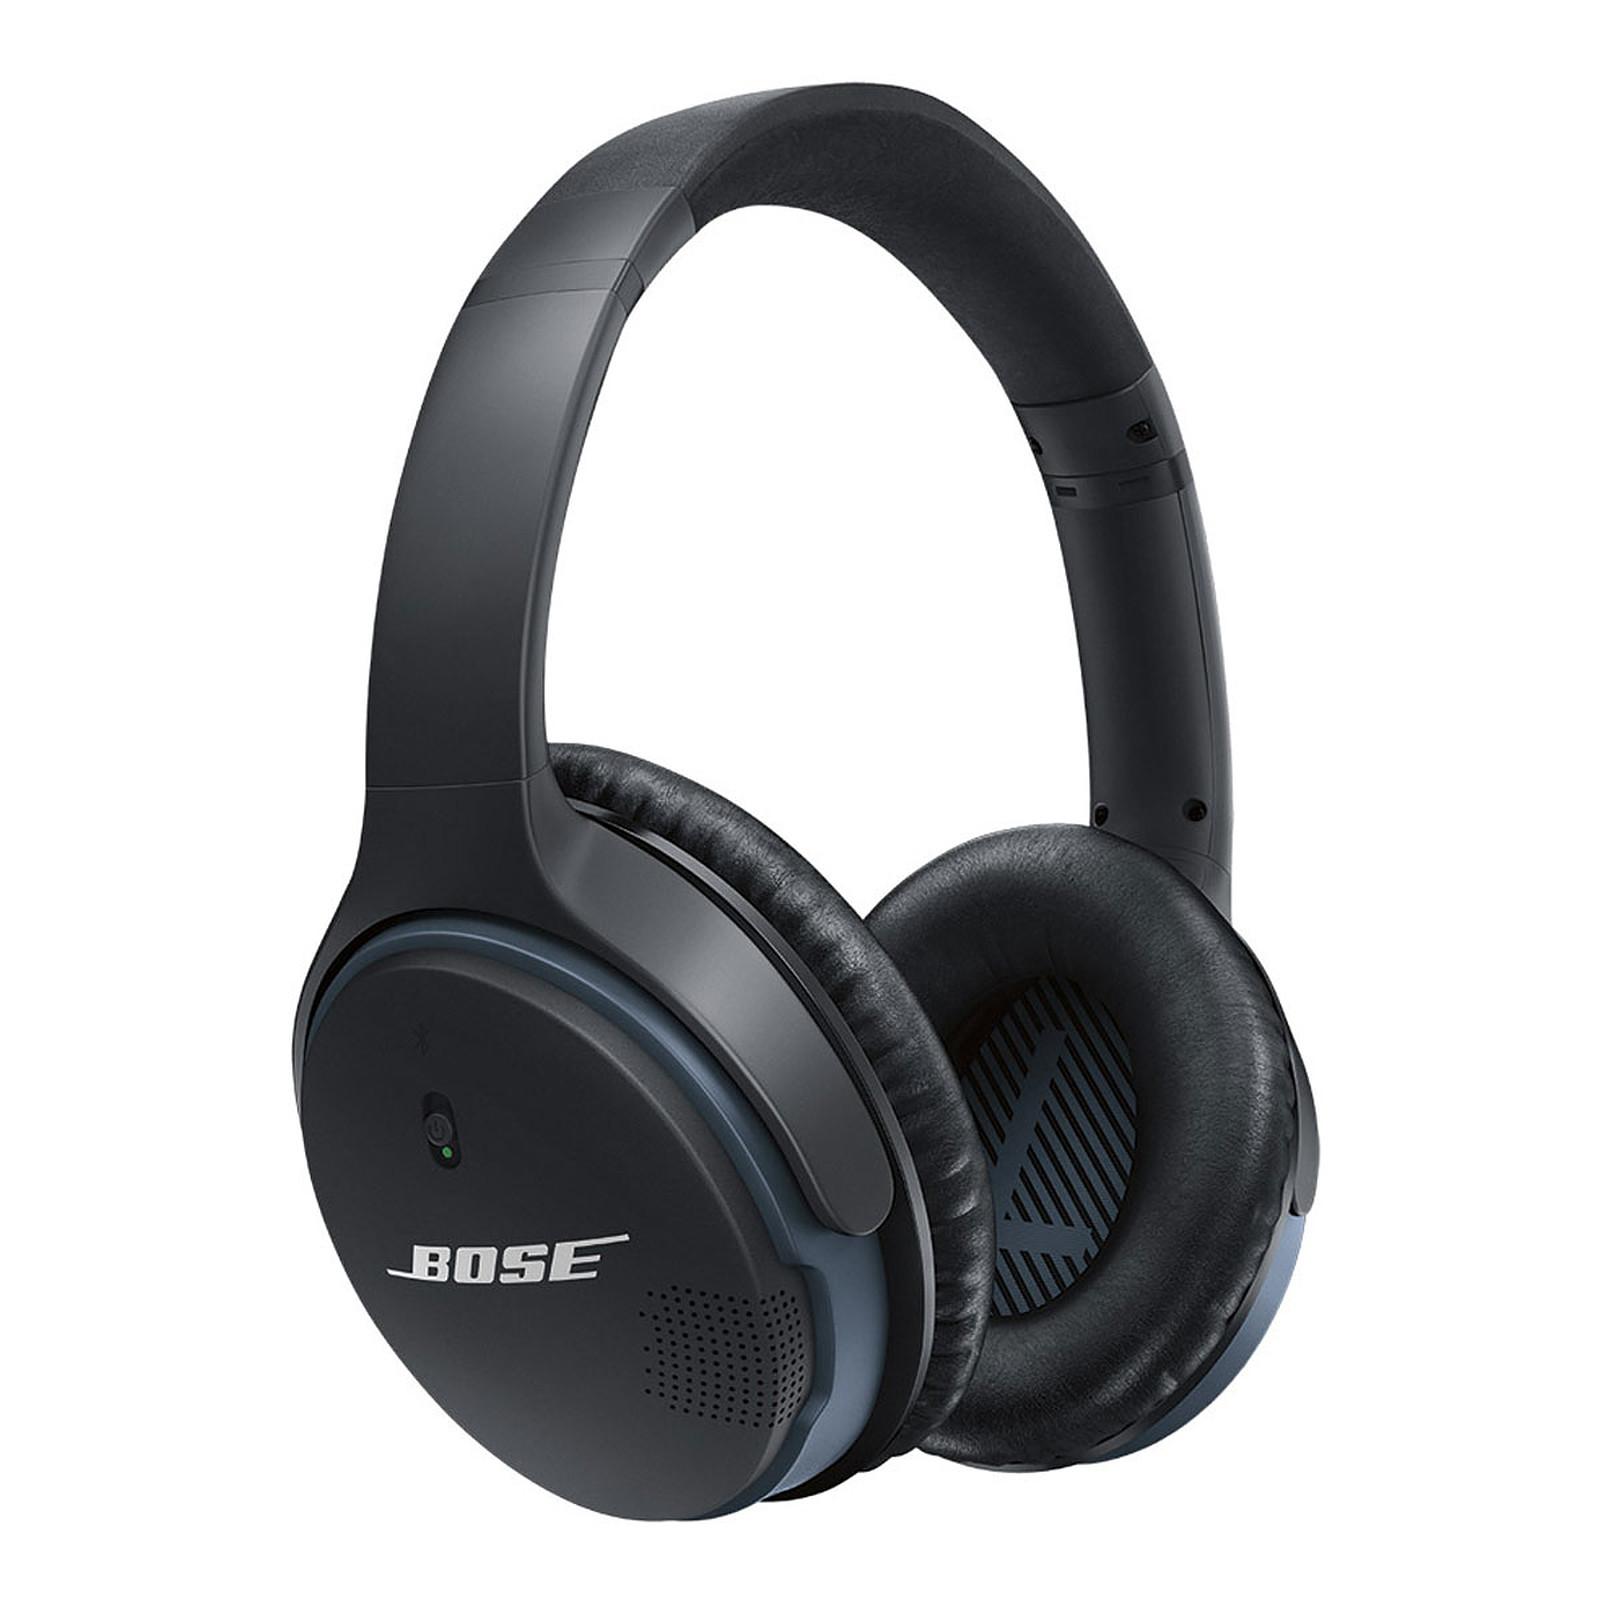 Bose Soundlink Ii Noir Casque Bose Sur Ldlccom